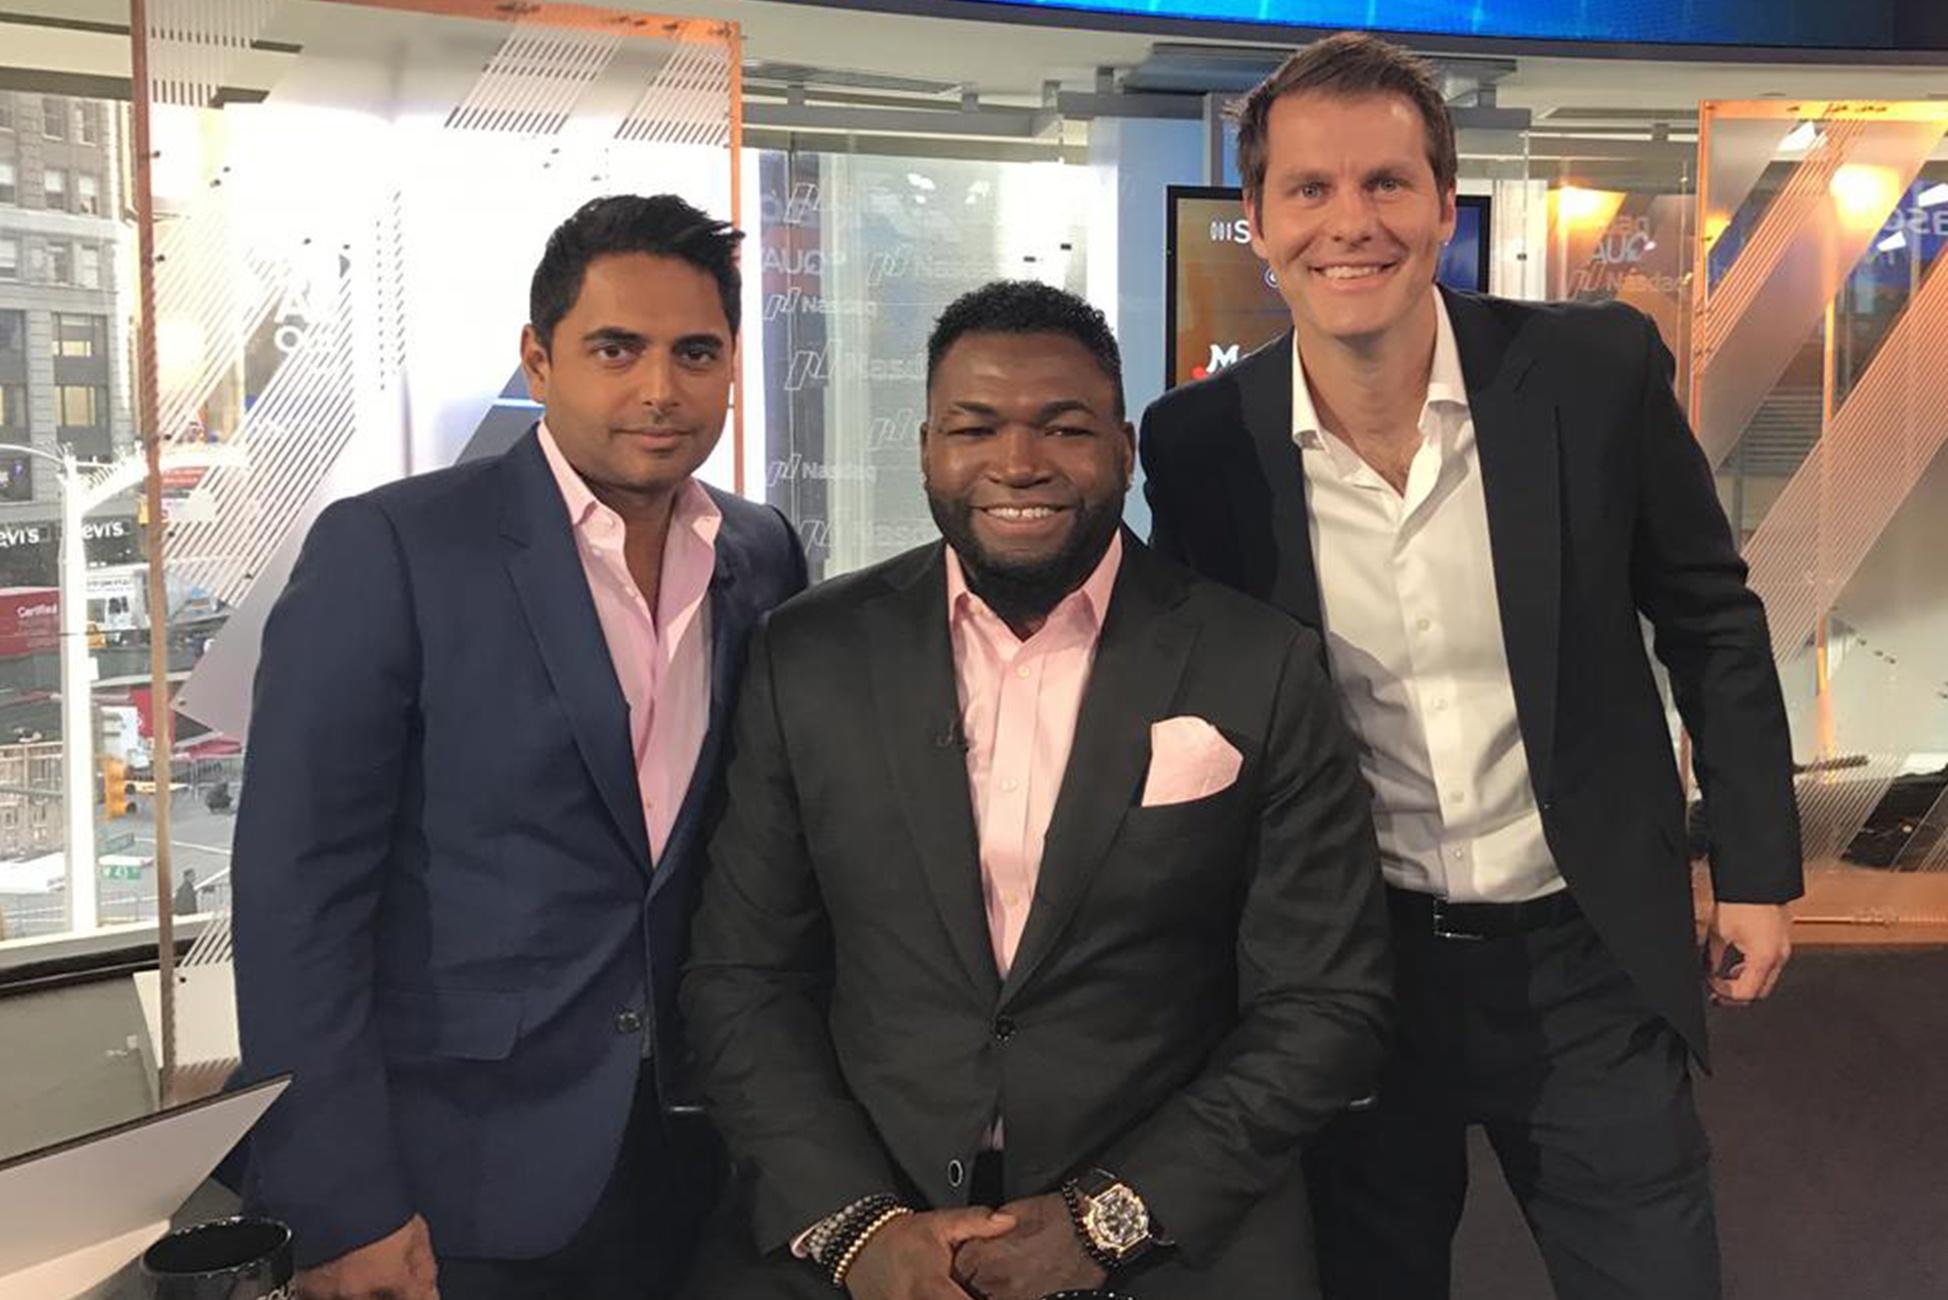 CAVU Ventures founders Rohan Oza (L), former MLB all-star David Ortiz & Brett Thomas (R).